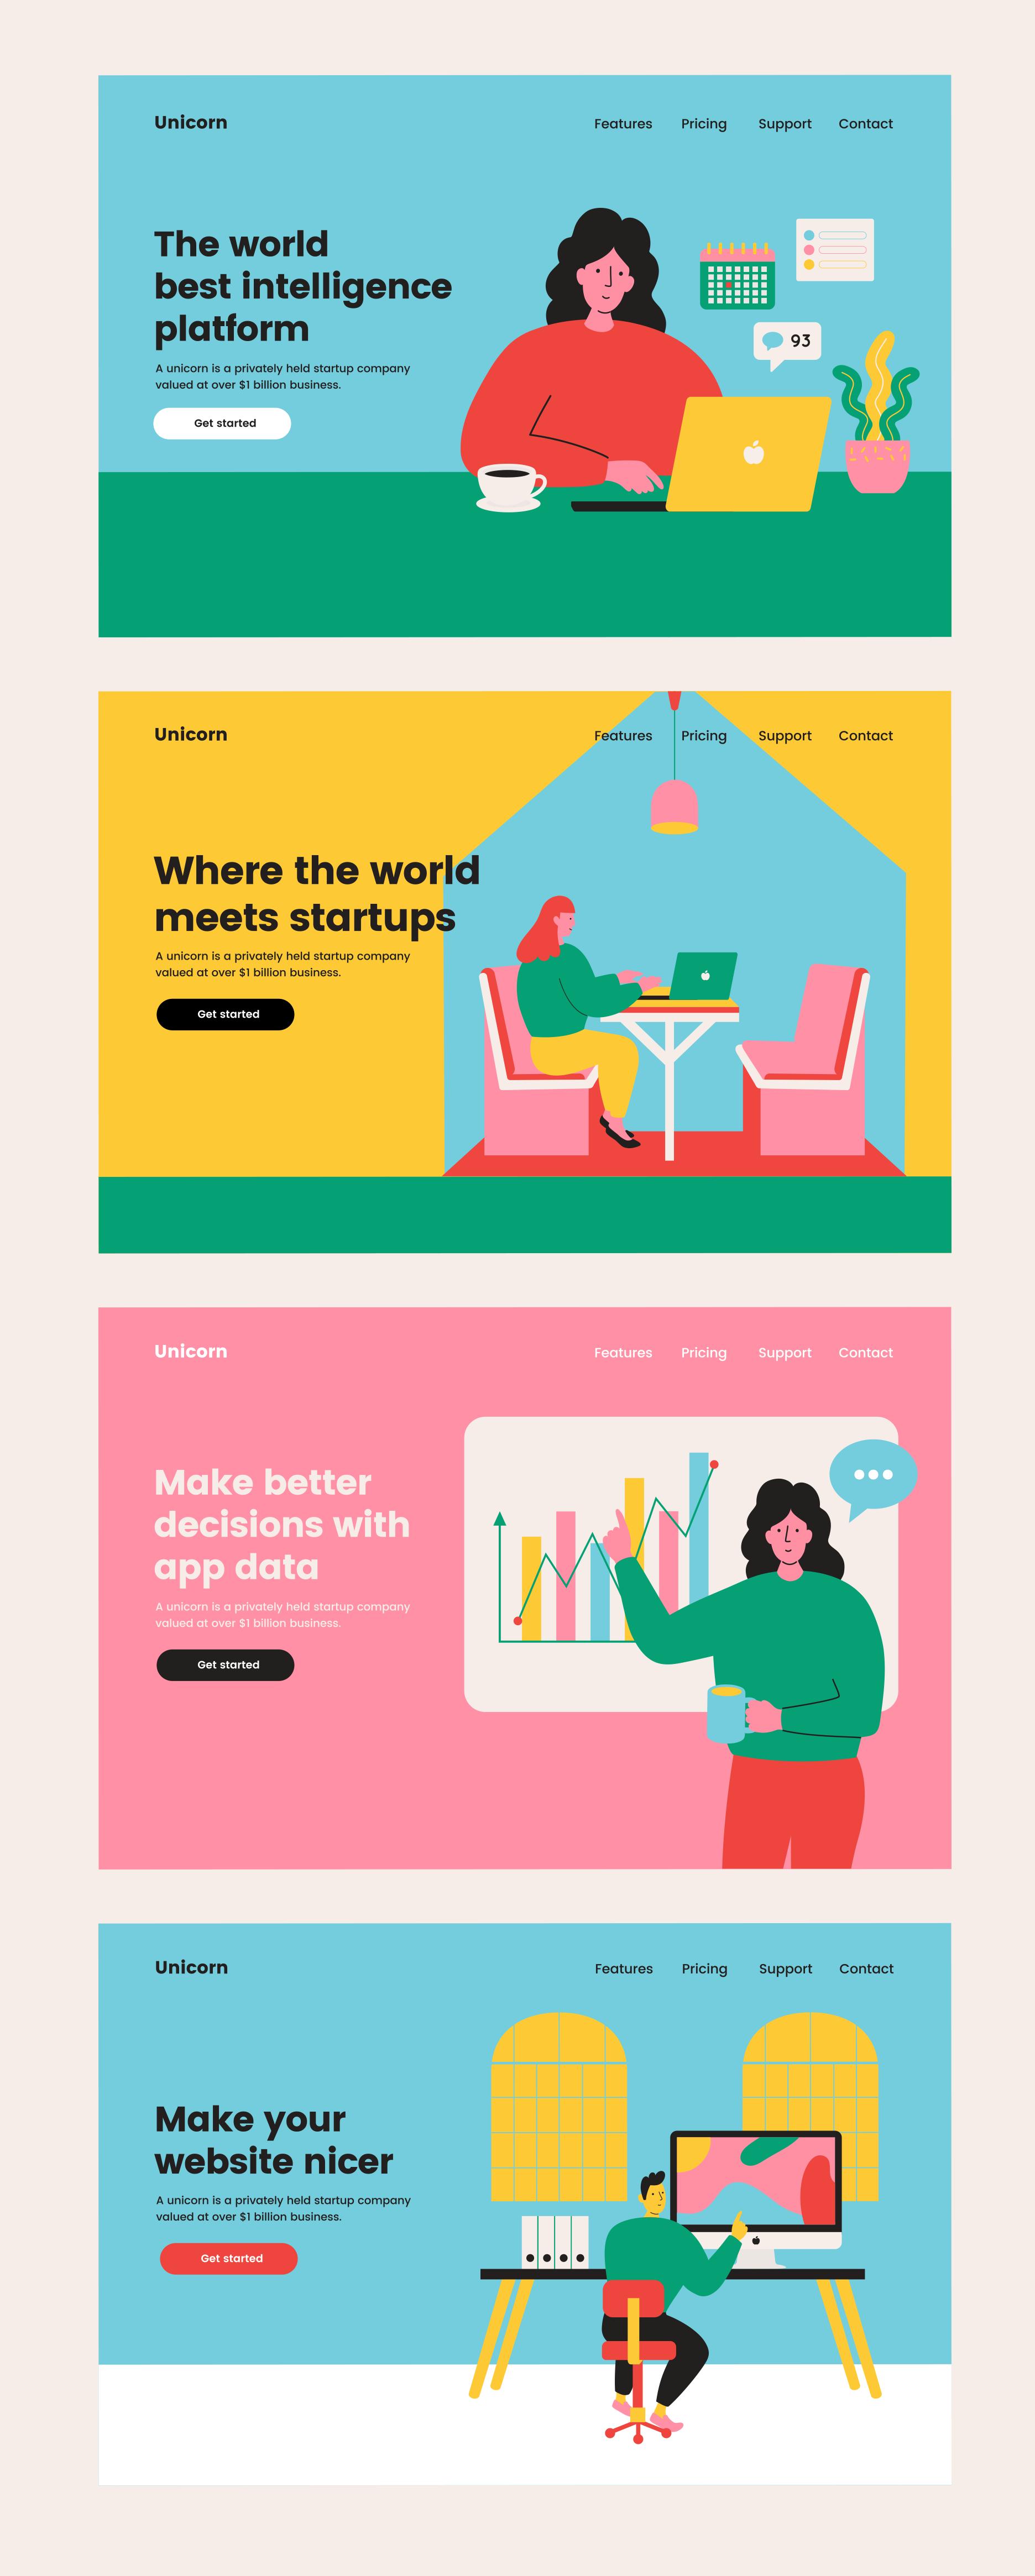 Slider revolution plugin marketo ecommerce marketplace wordpress.